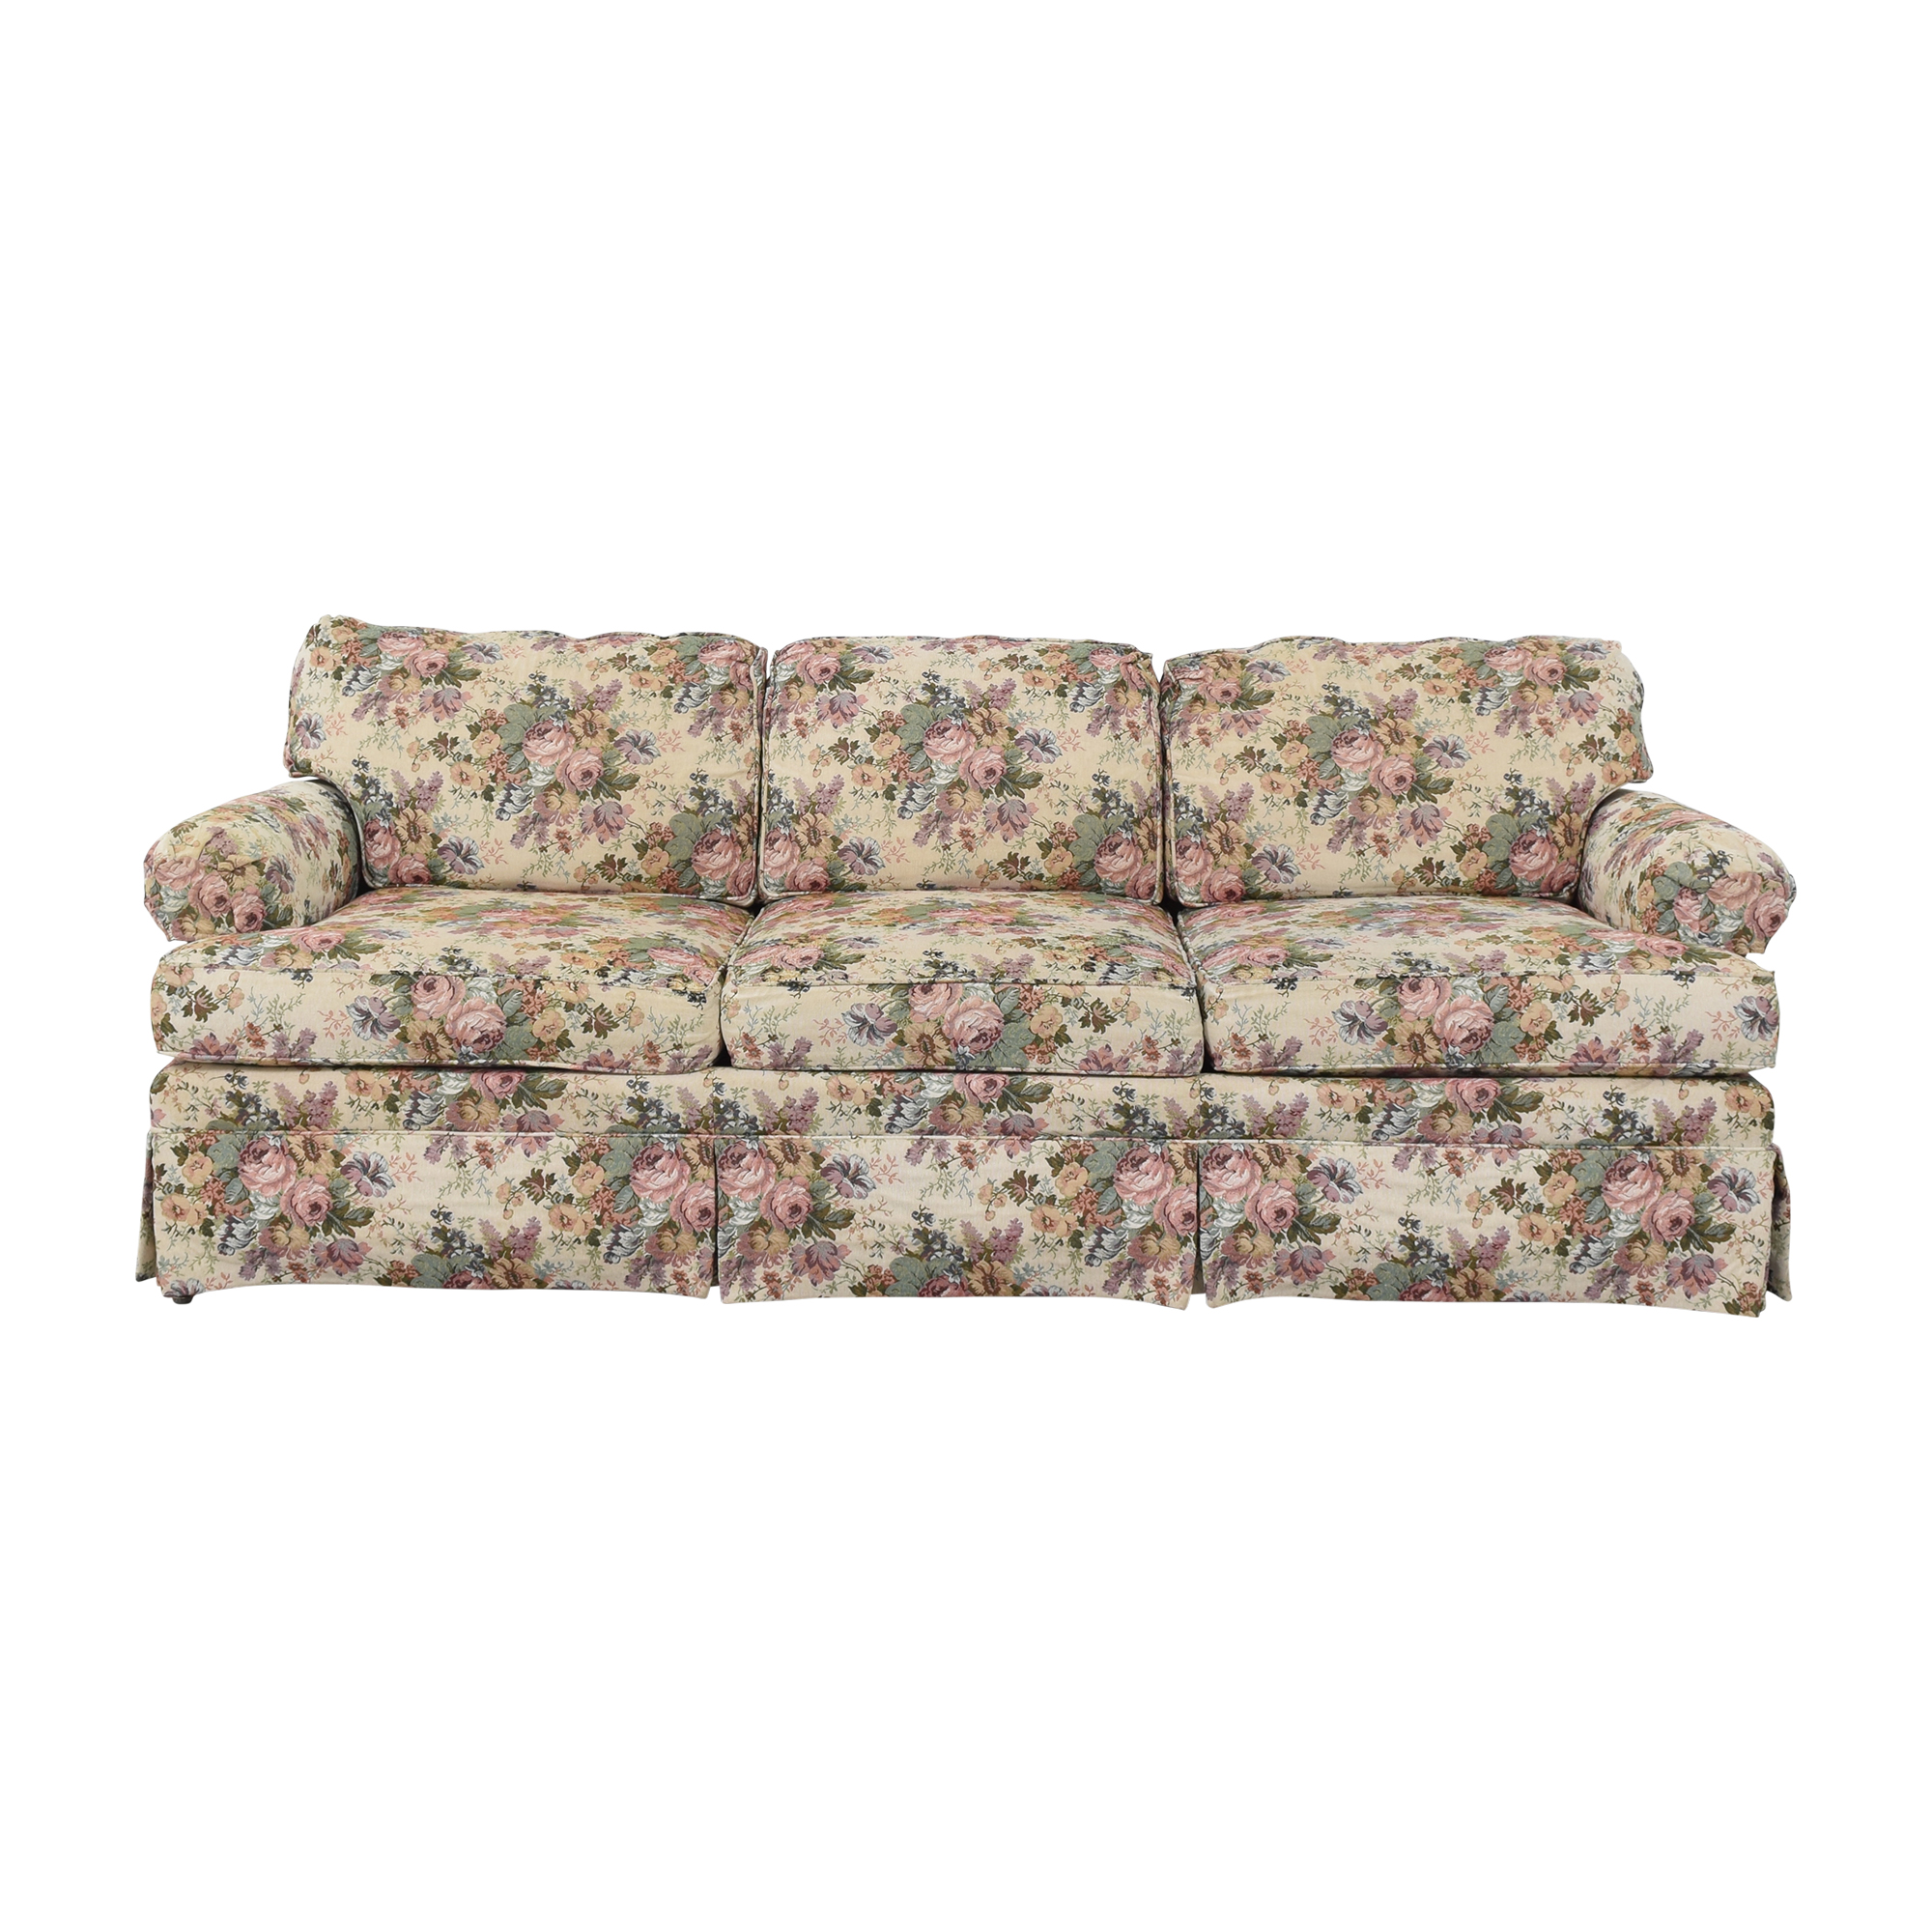 Ethan Allen Ethan Allen Floral Sofa